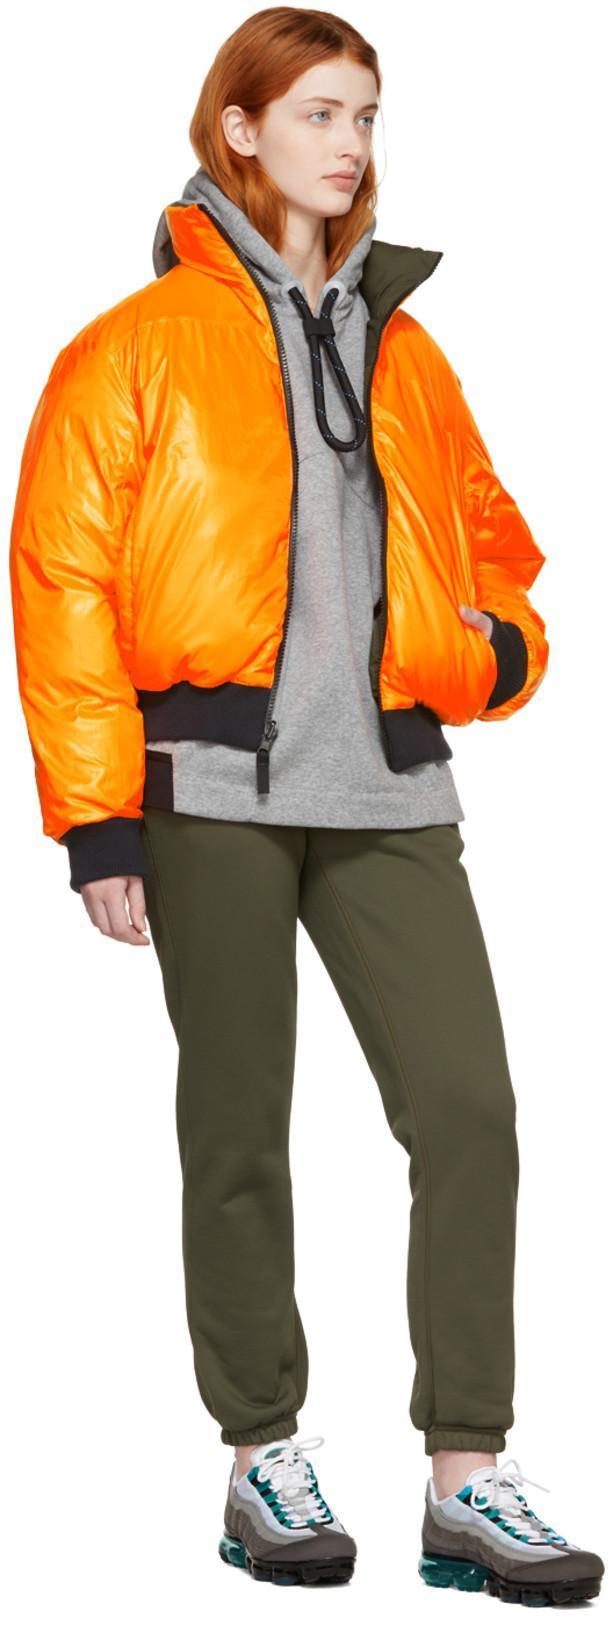 d41c787eae NIKE Nikelab Reversible Khaki And Orange Down Nrg Puffer Jacket in Cargo  Khaki